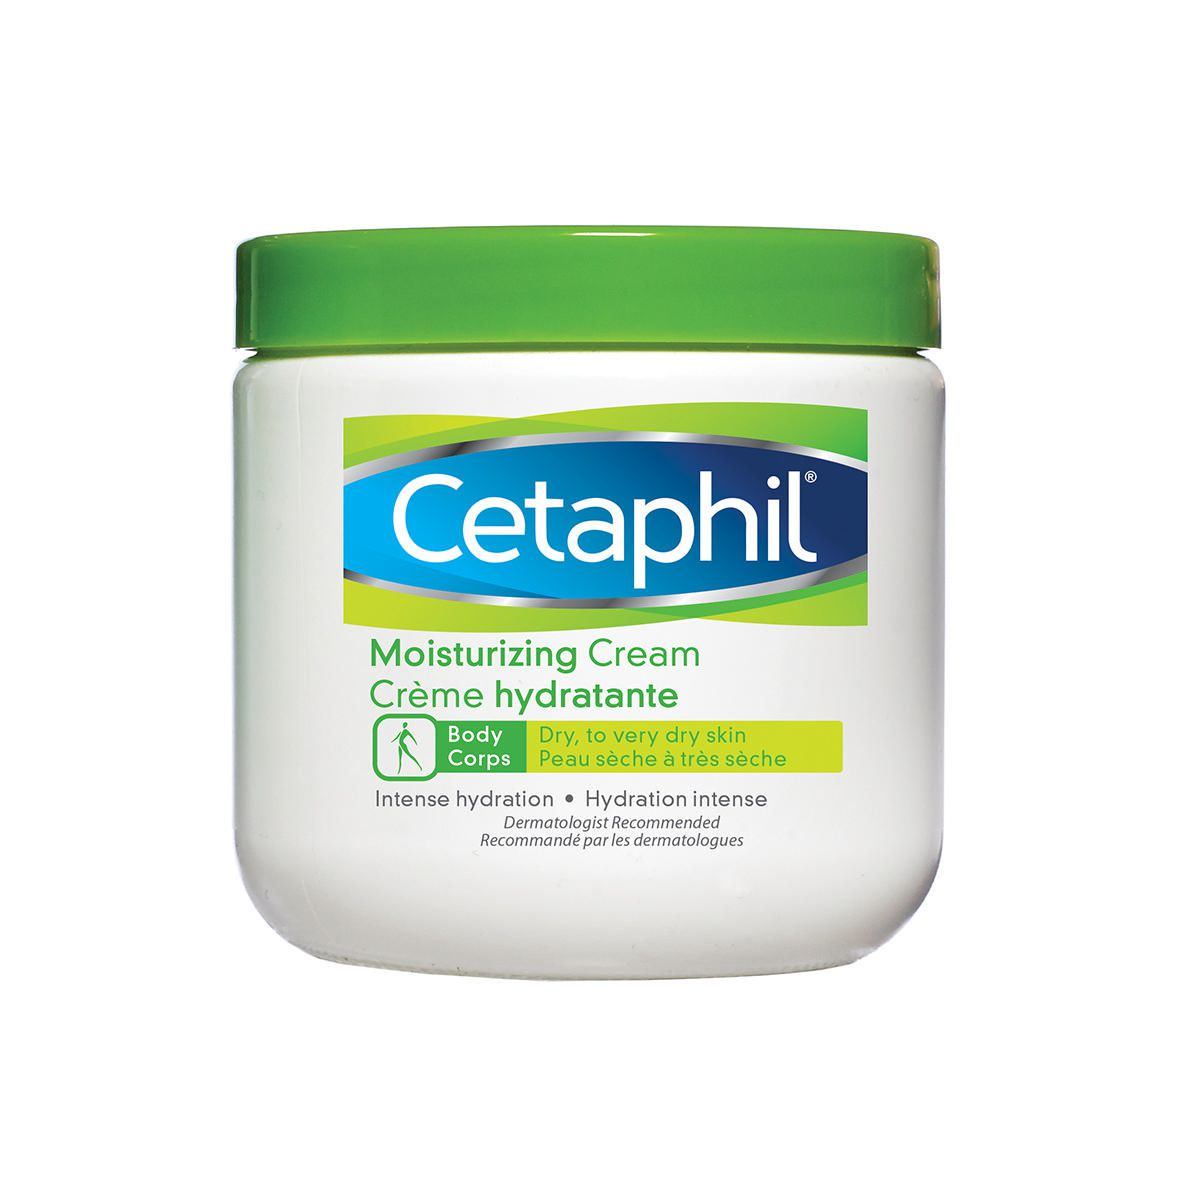 dưỡng ẩm toàn thân Cetaphil Moisturizing Body Cream